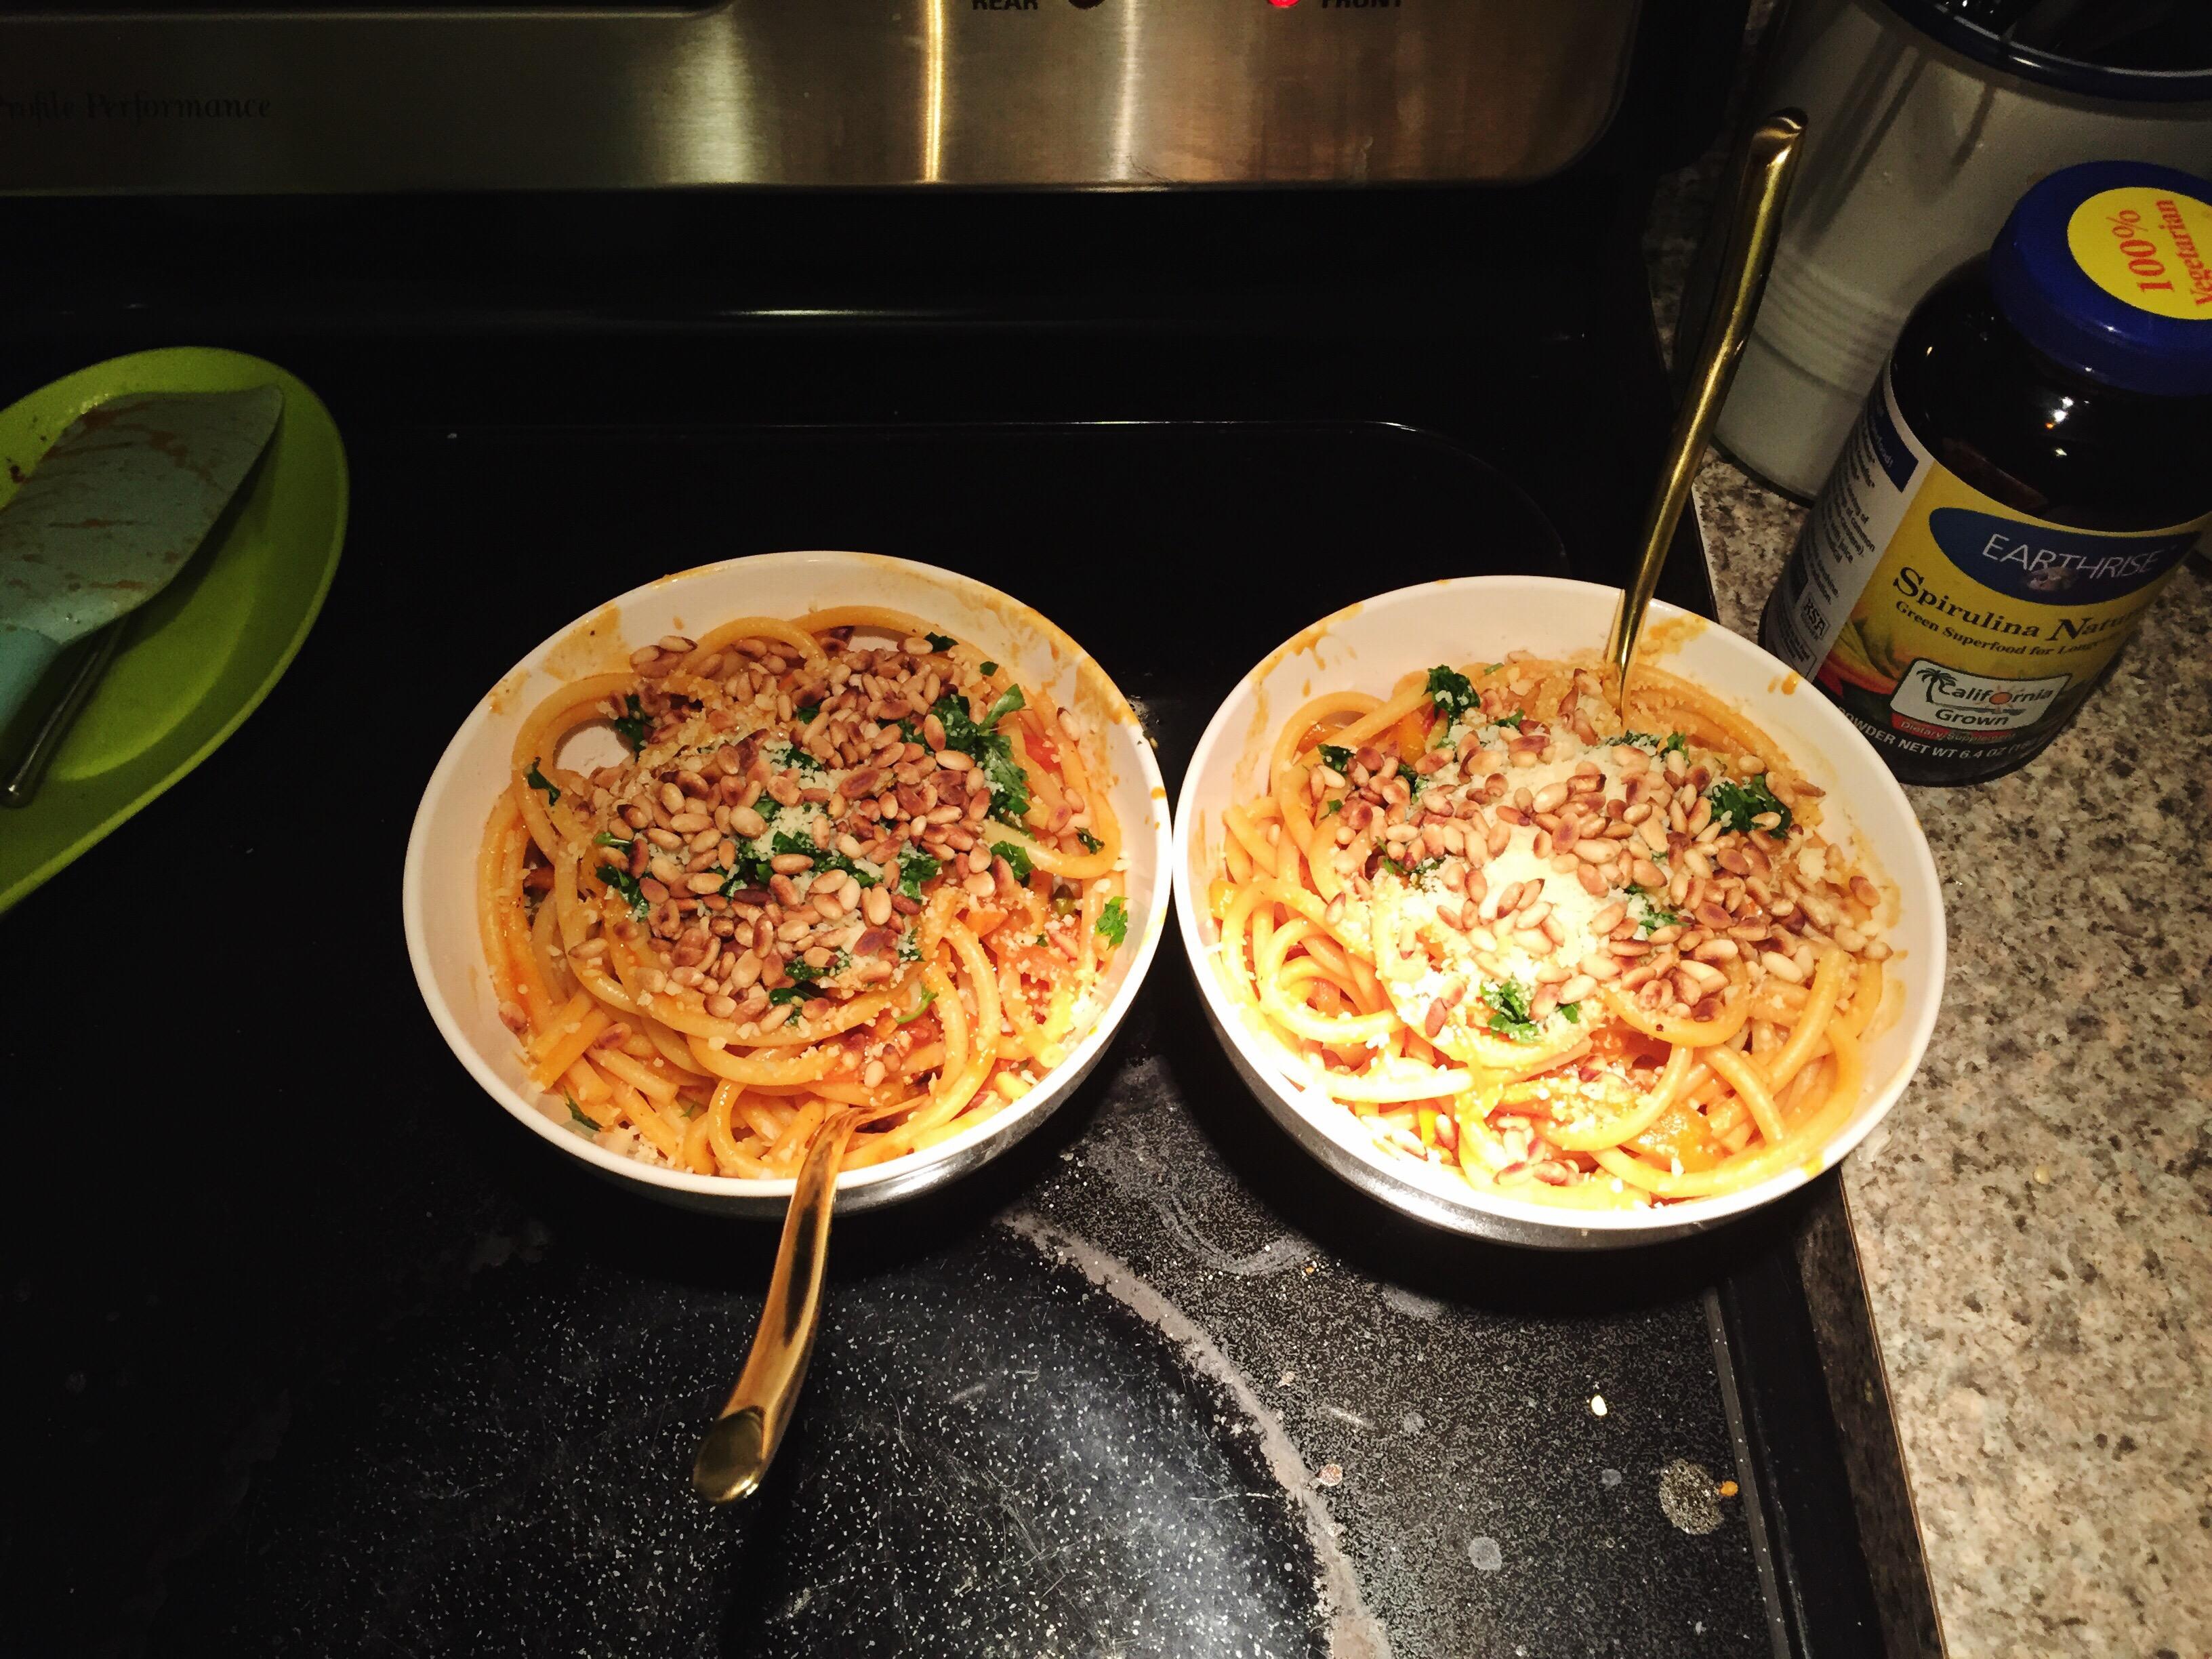 Blue apron udon noodles - Stats For Peperonata Pasta